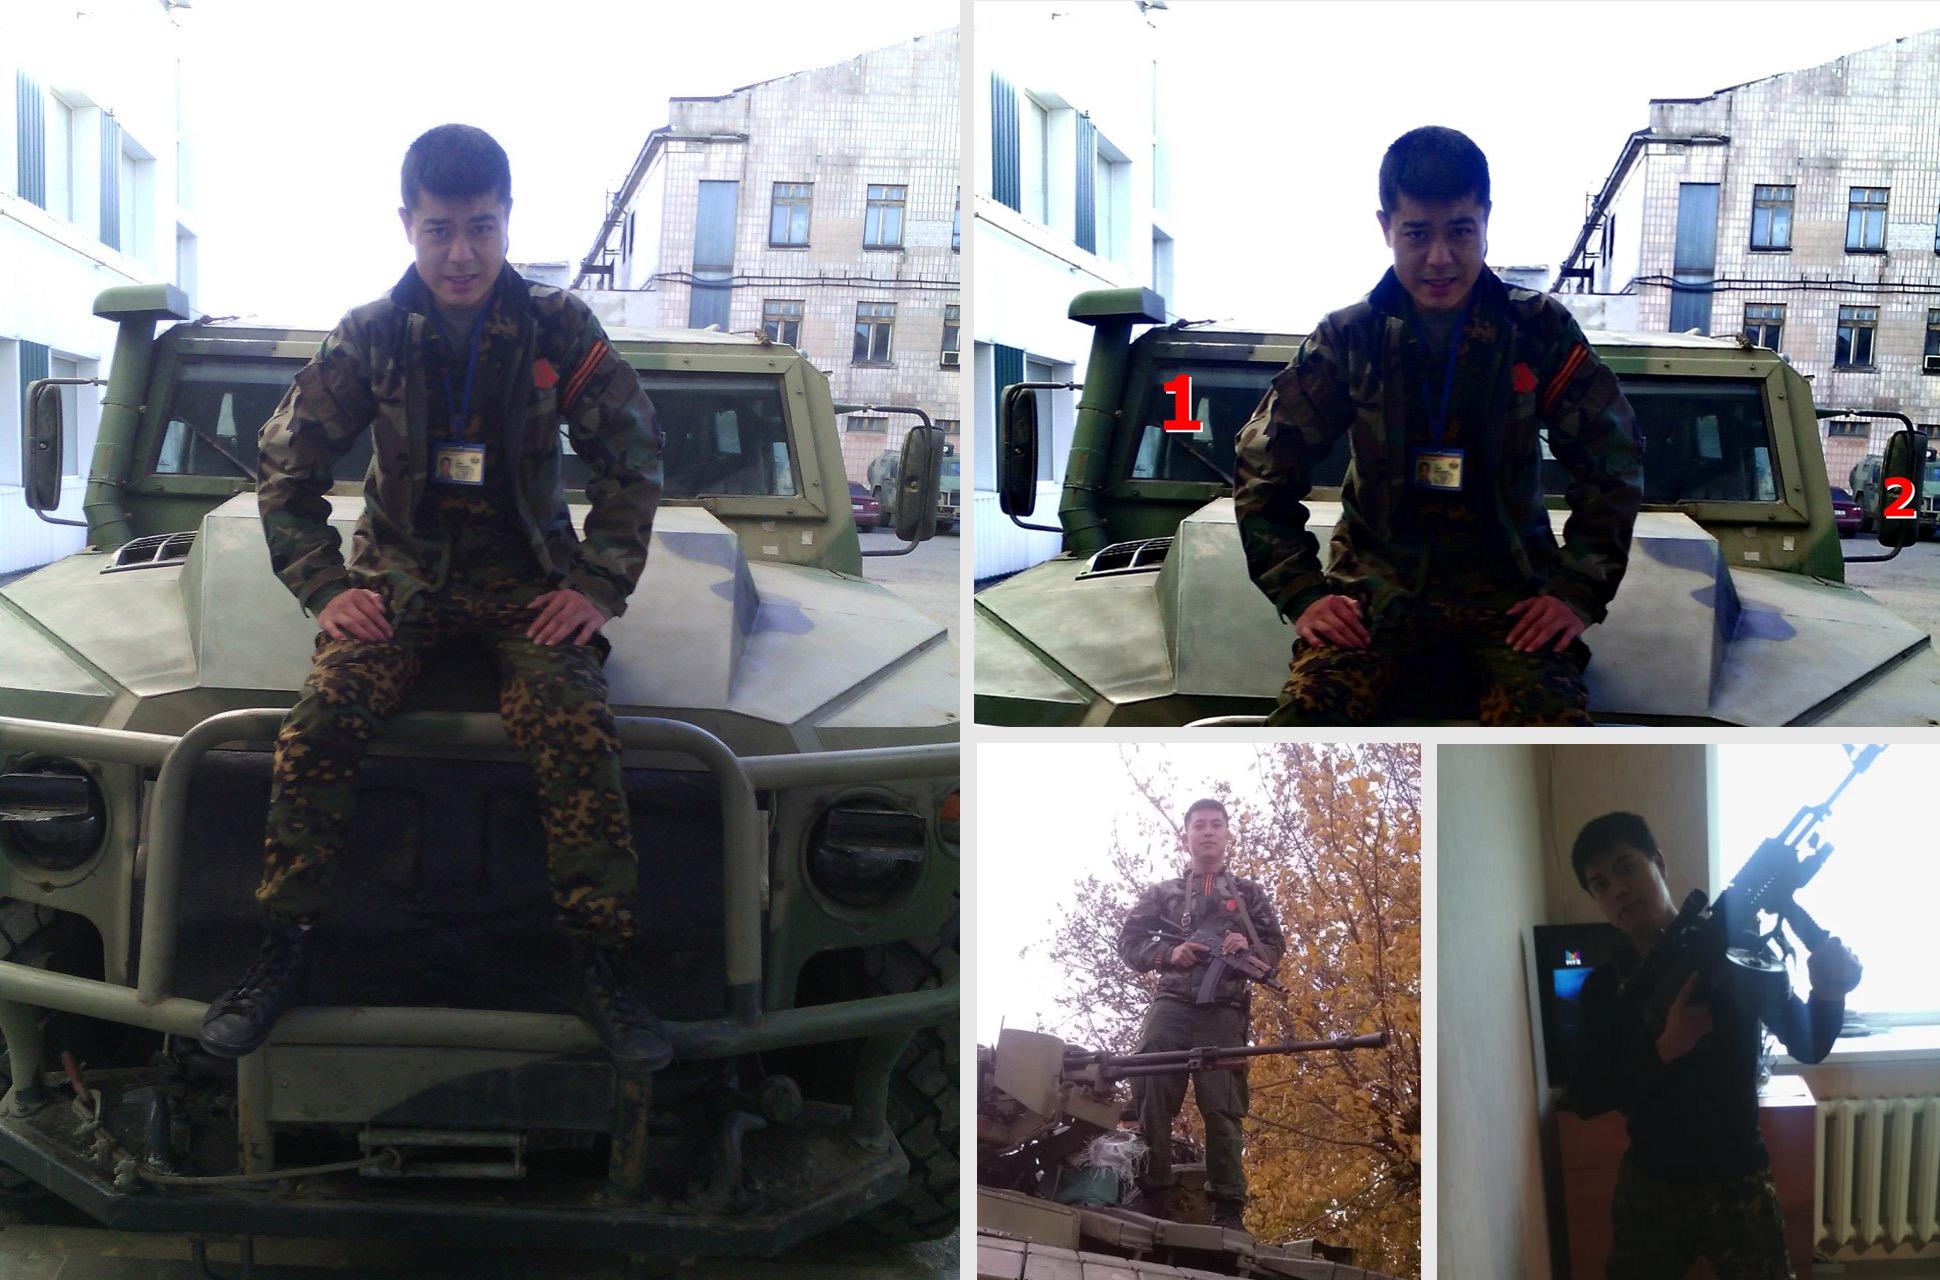 Rysk bepansrad Tigr MK-BLA-01 (InformNapalm på svenska)